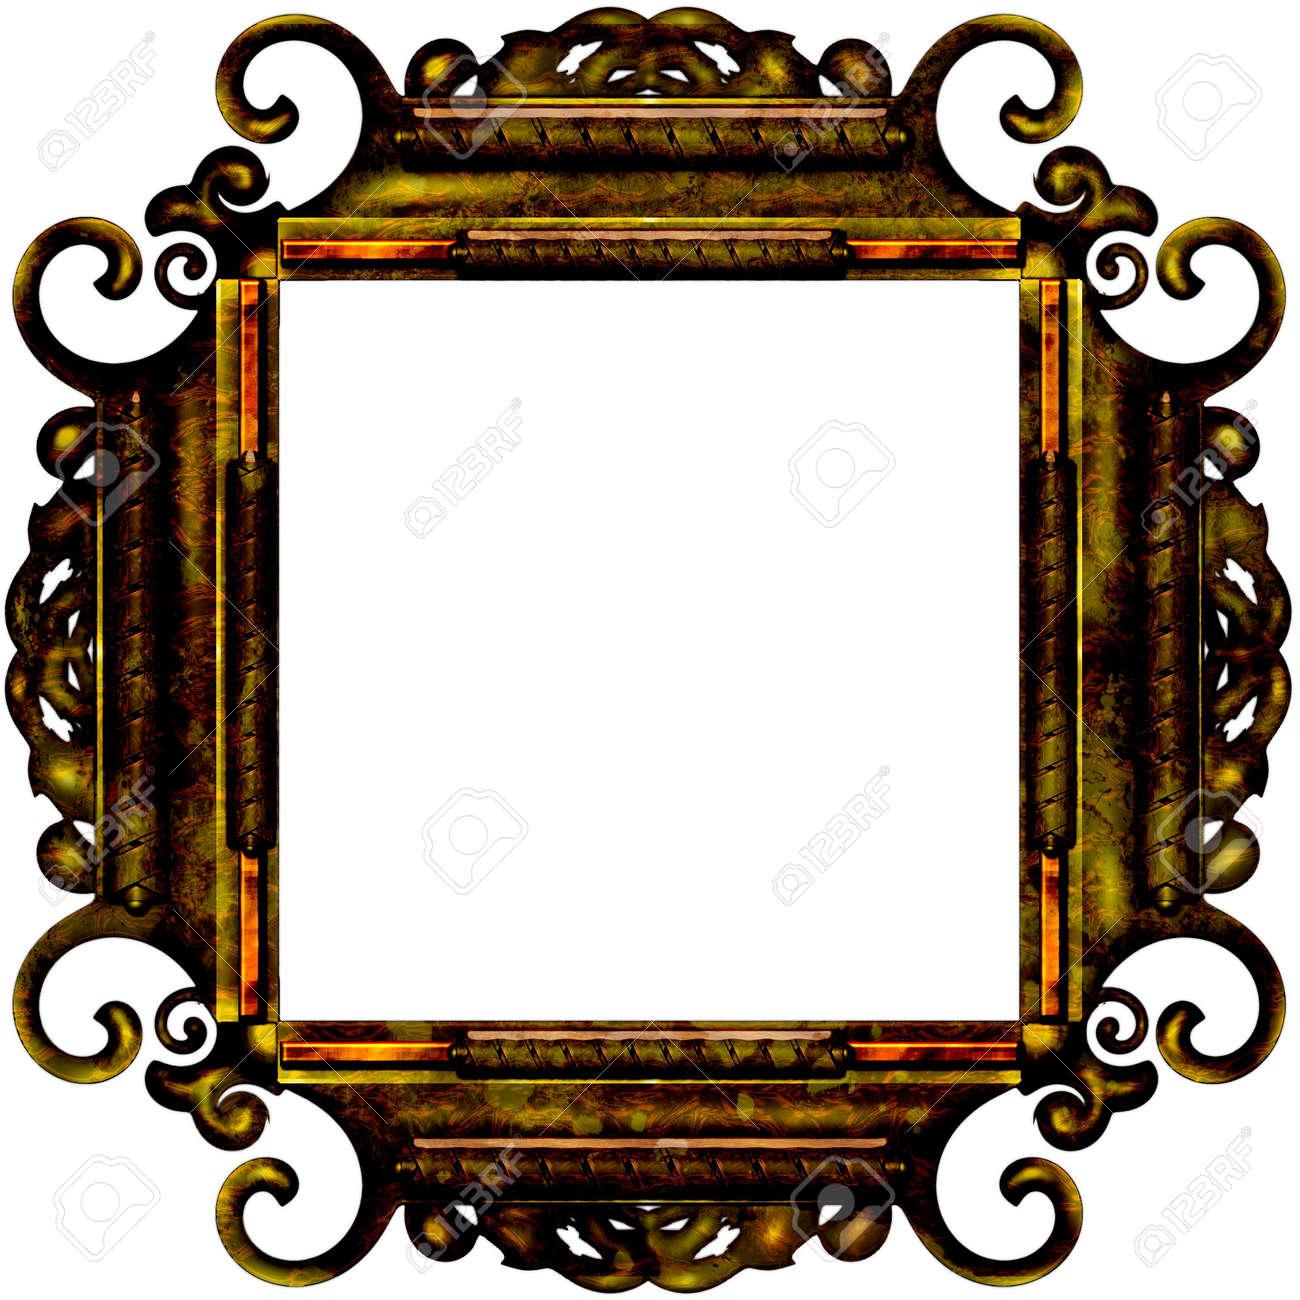 Photo frame for web or wallpaper on desktop Stock Photo - 7506305